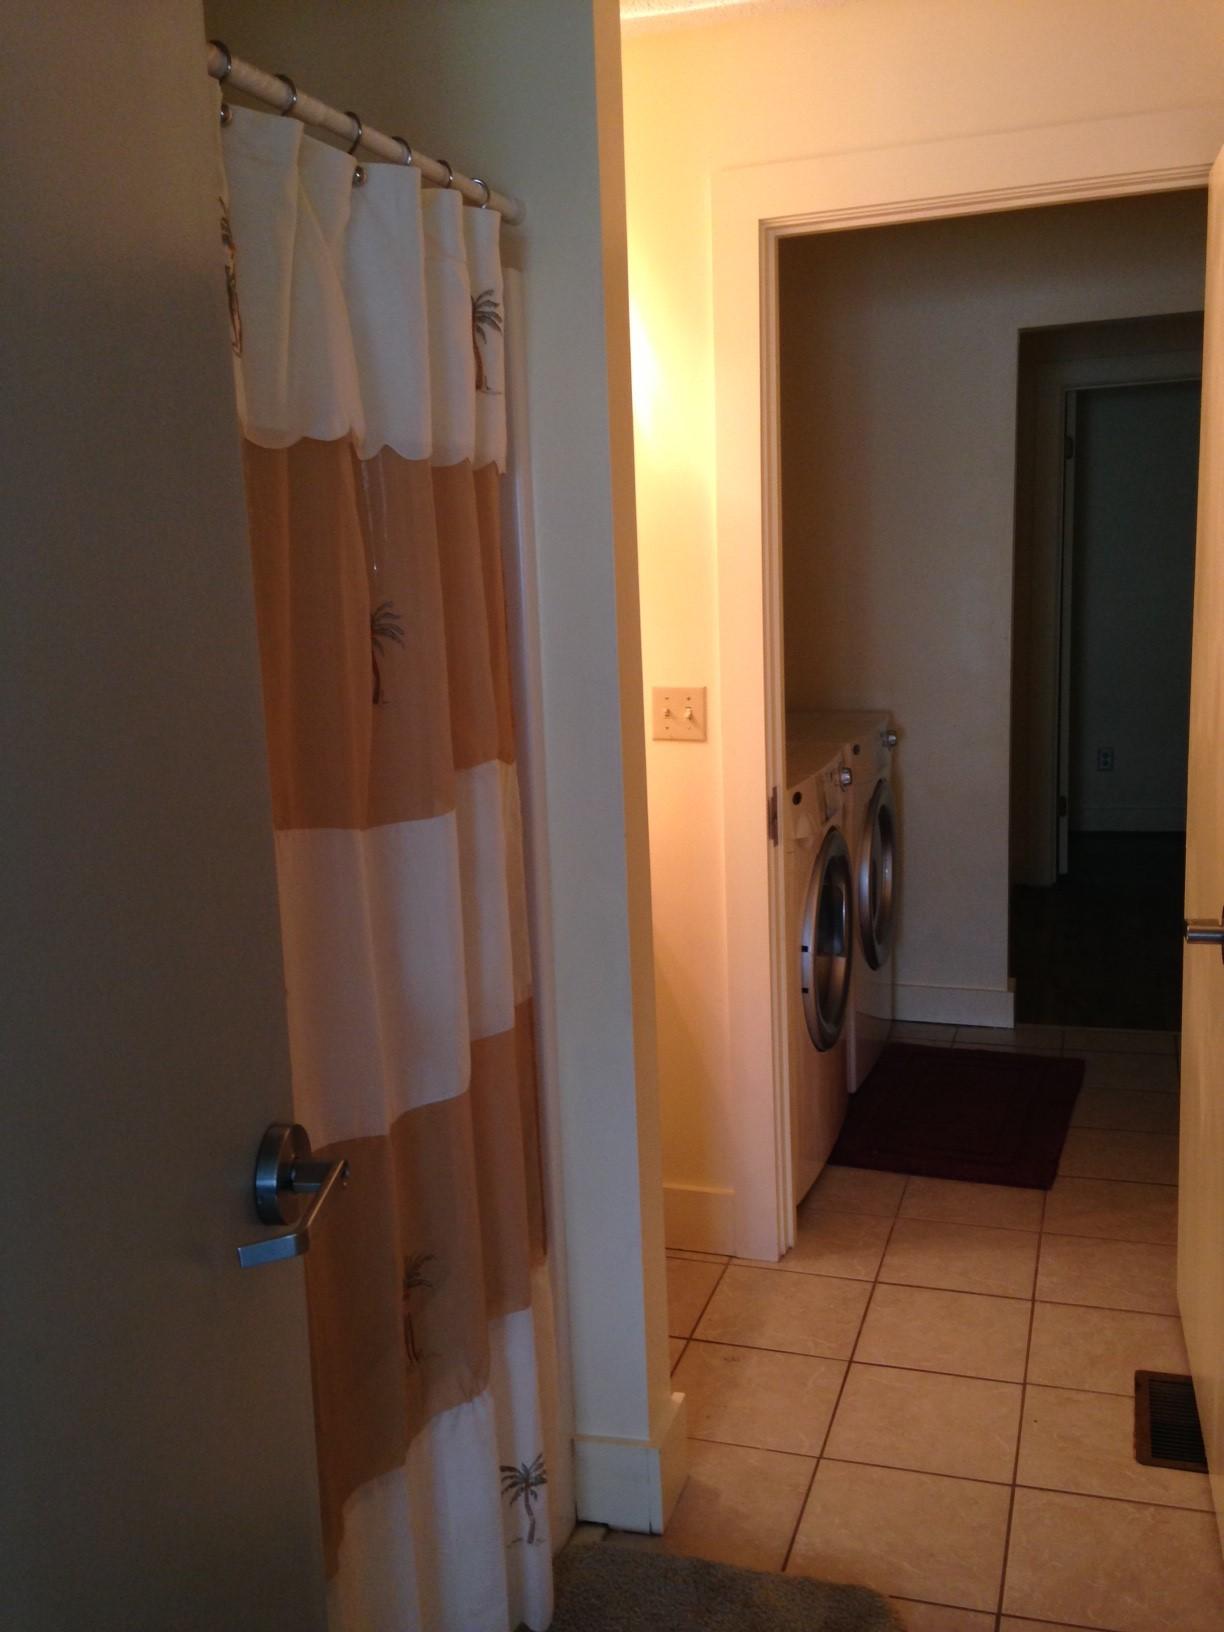 Bathroom 3 & Laundry